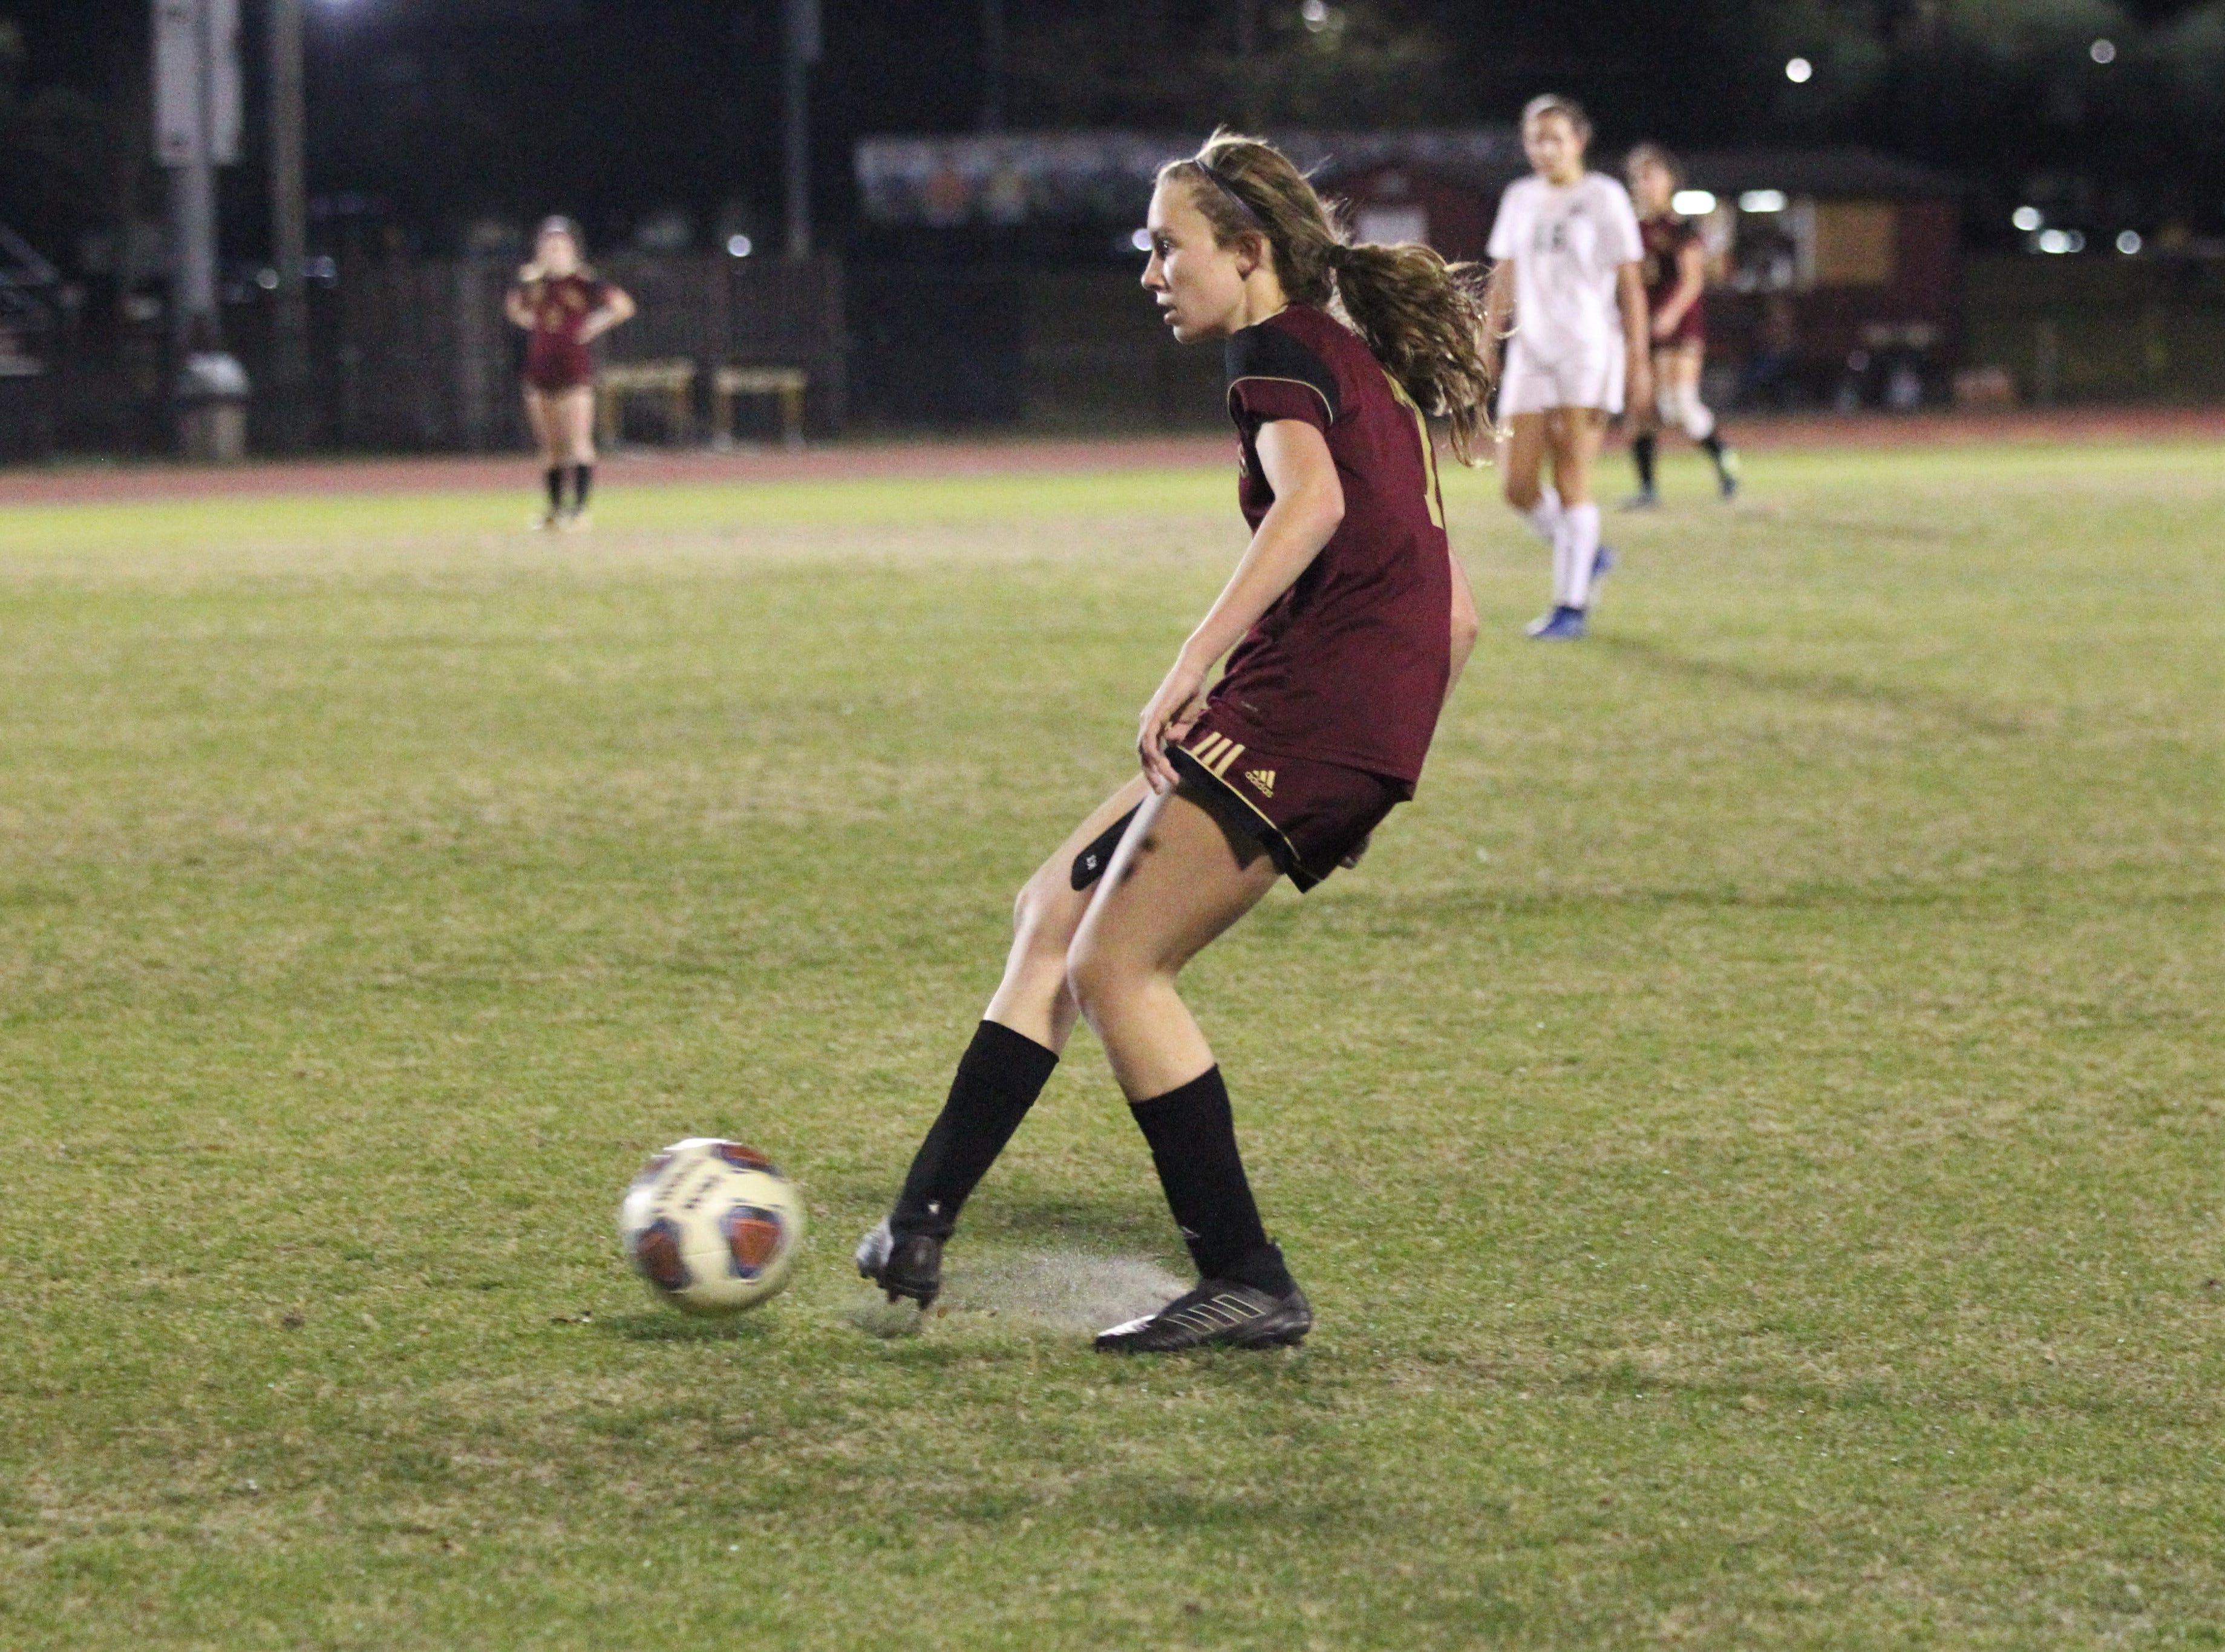 Florida High's Ava Dubois passes ahead as South Walton edged the Seminoles 5-4 in a penalty-kick shootout during a Region 1-2A semifinal on Feb. 8, 2019.